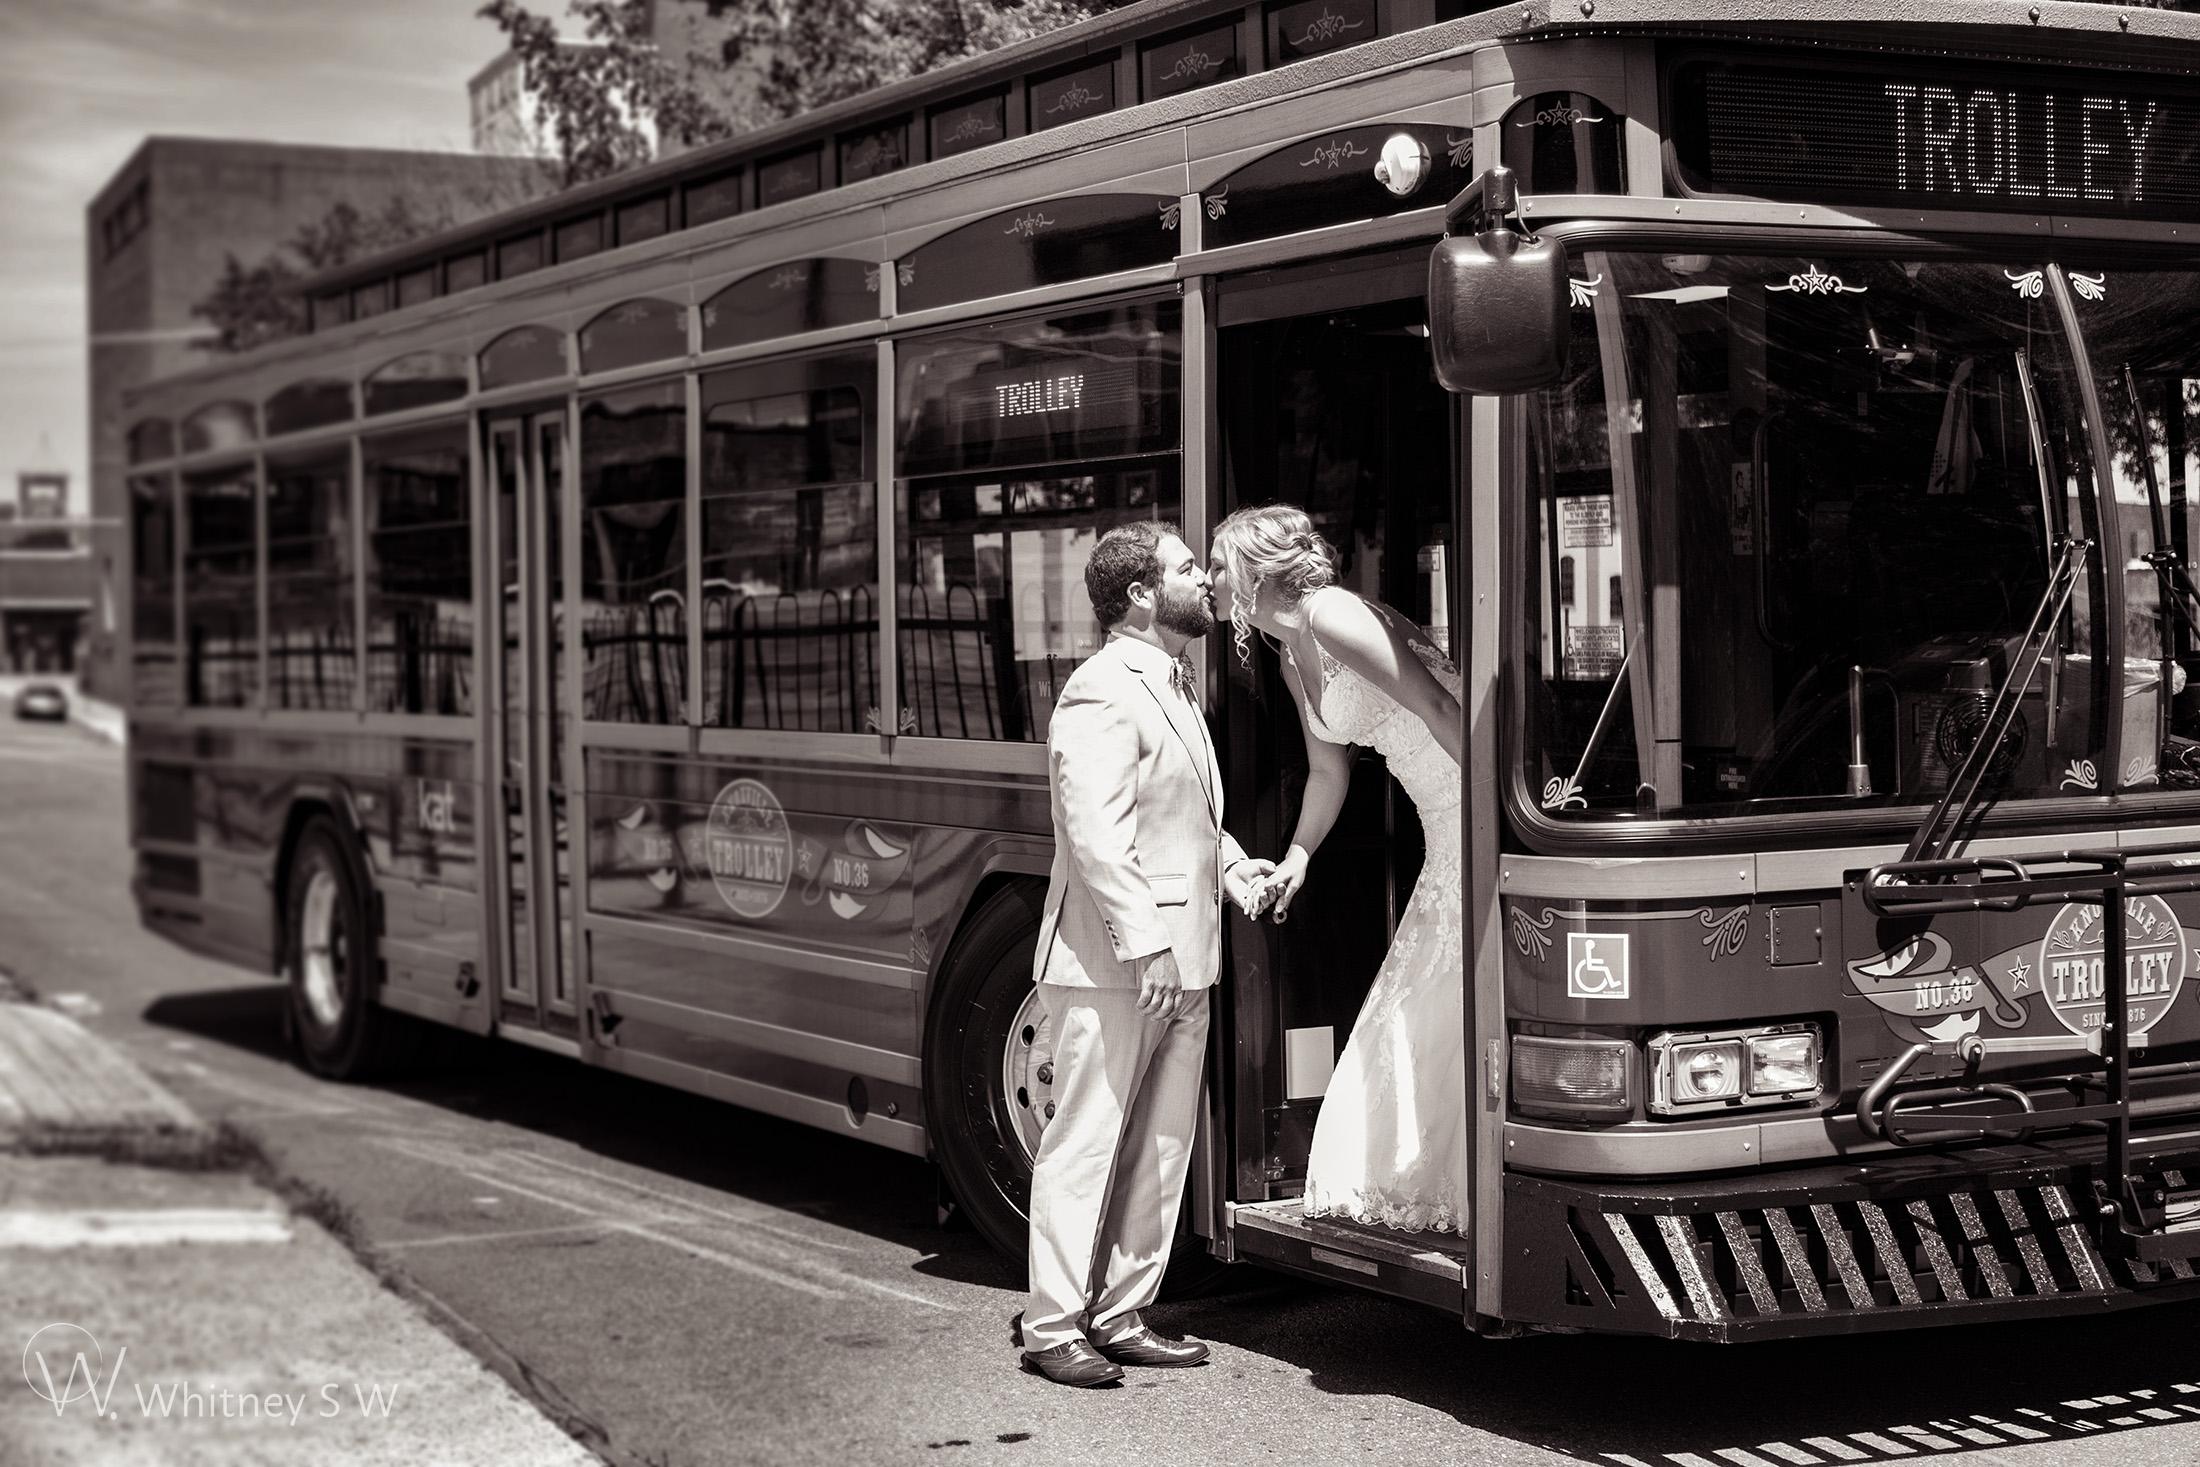 Morgan & Kaivon Wedding - Photography by Whitney S Williams whitneysw (3).jpg